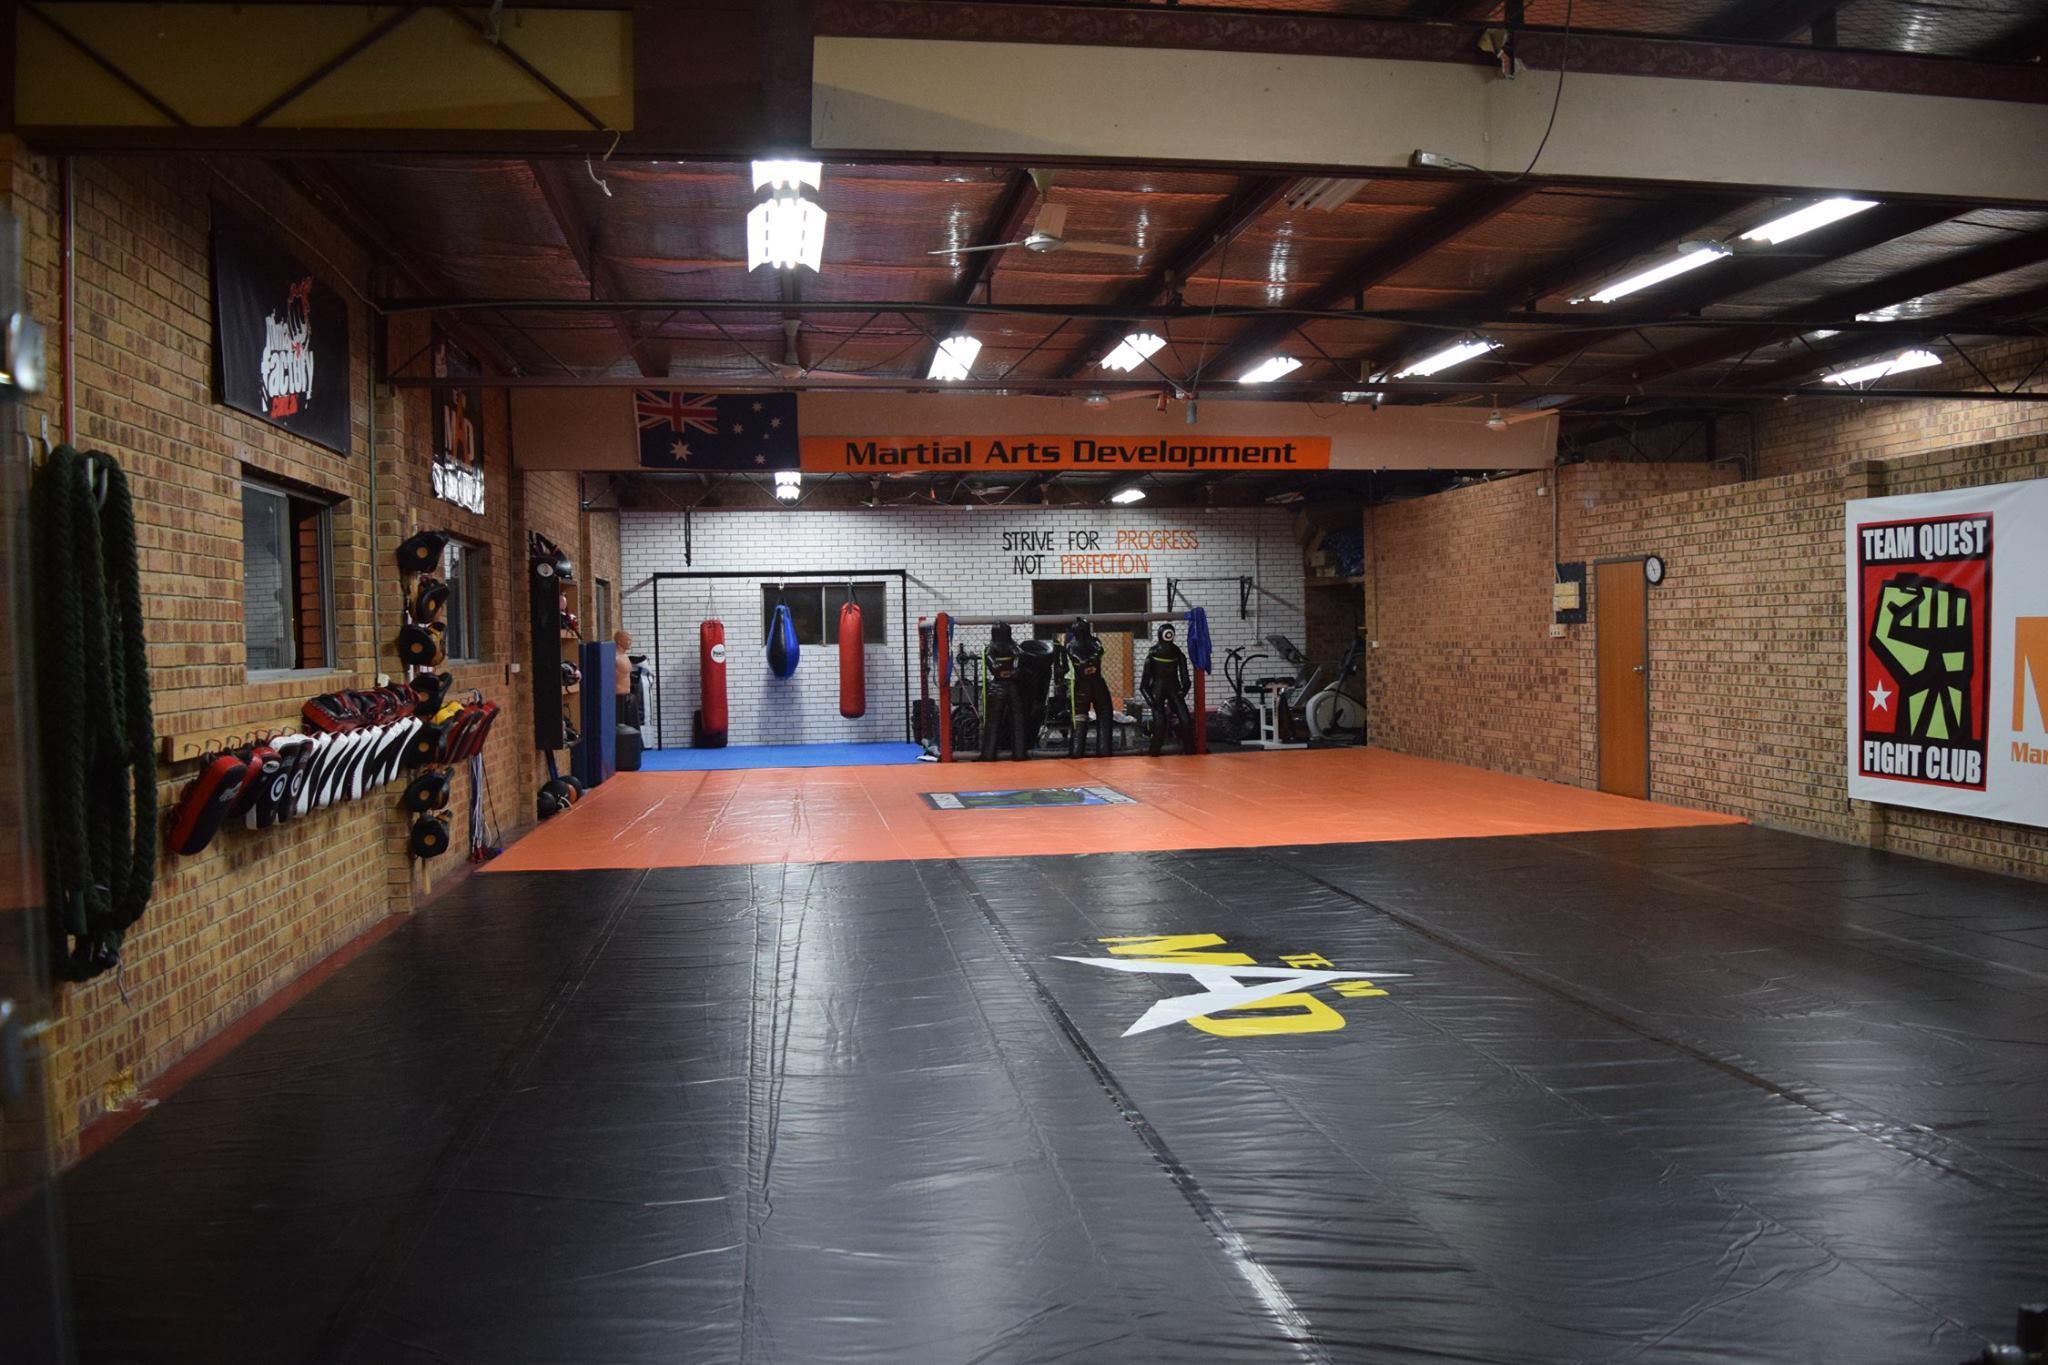 Take Self Defence Classes at Martial Arts Development